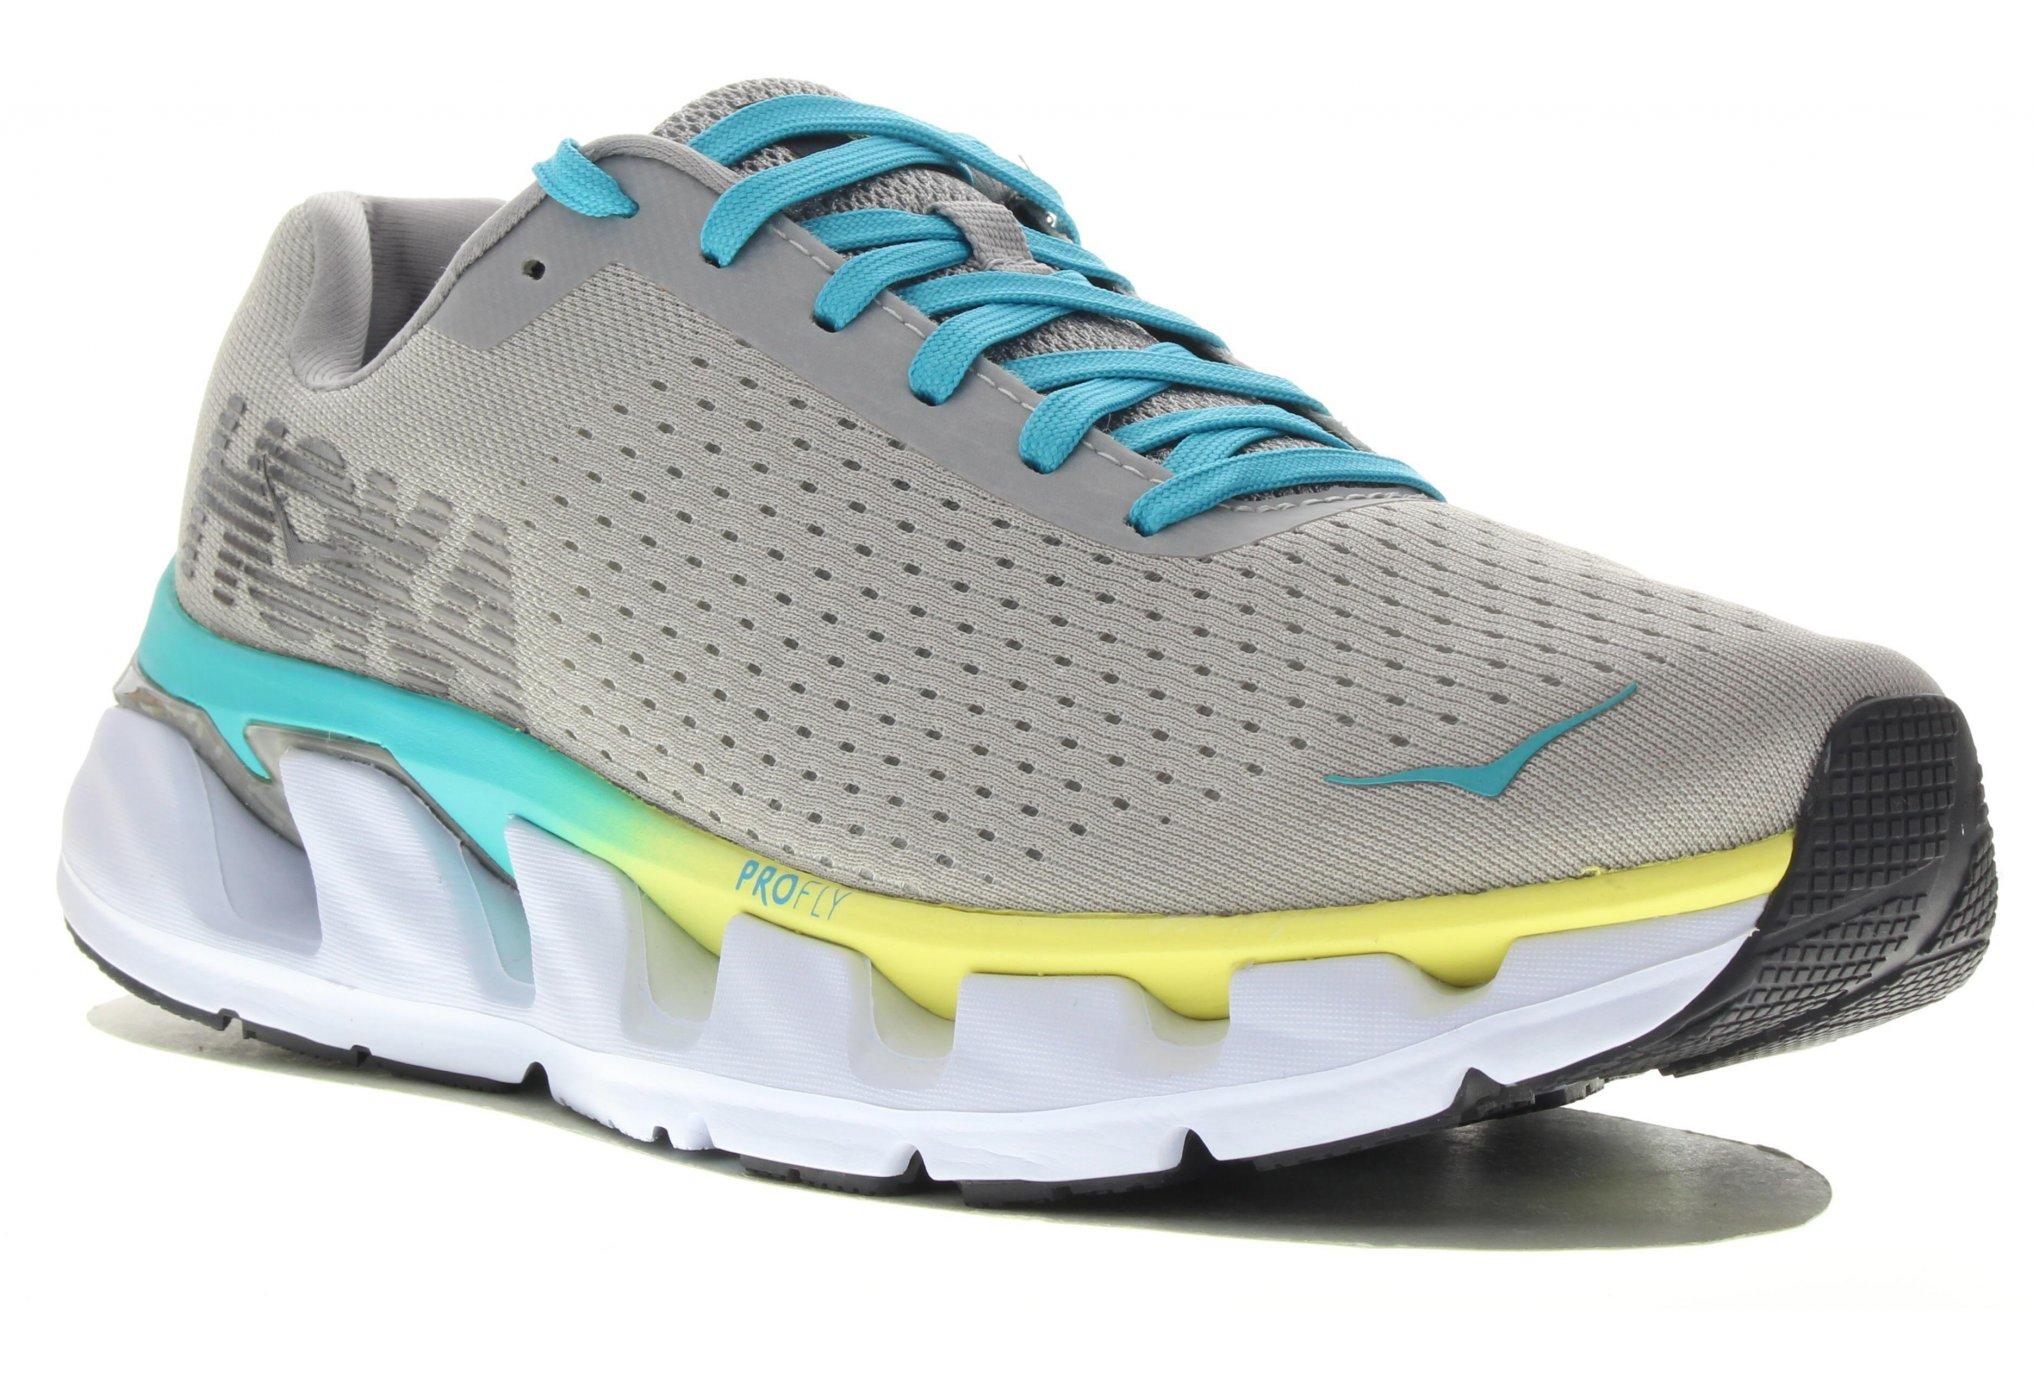 Hoka One One Elevon Chaussures running femme